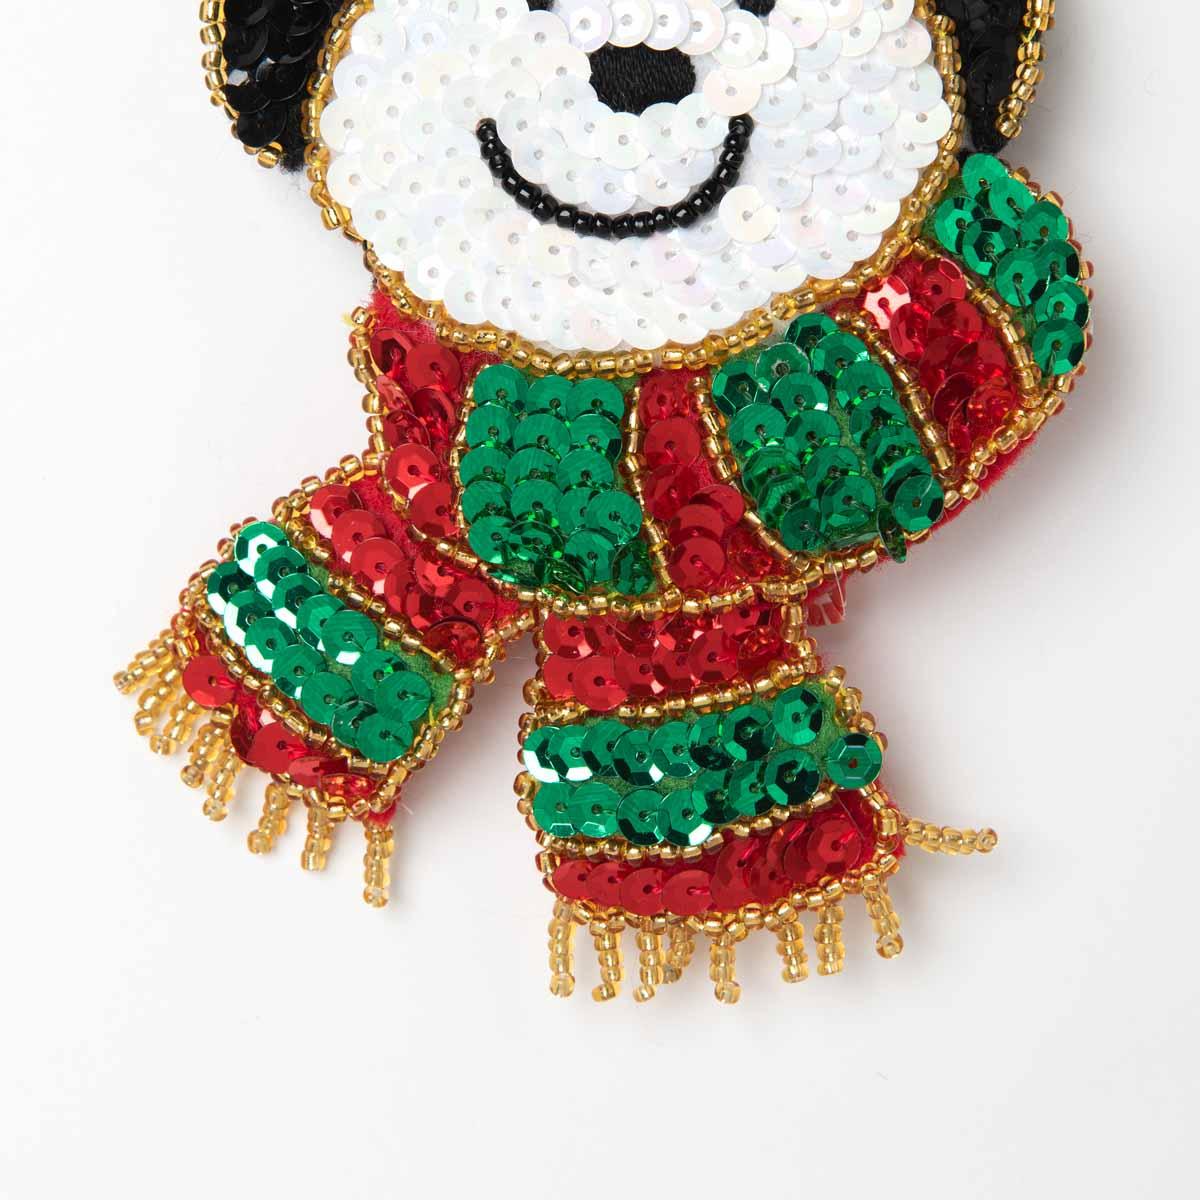 Bucilla ® Seasonal - Felt - Ornament Kits - Glitz Santa - 89263E